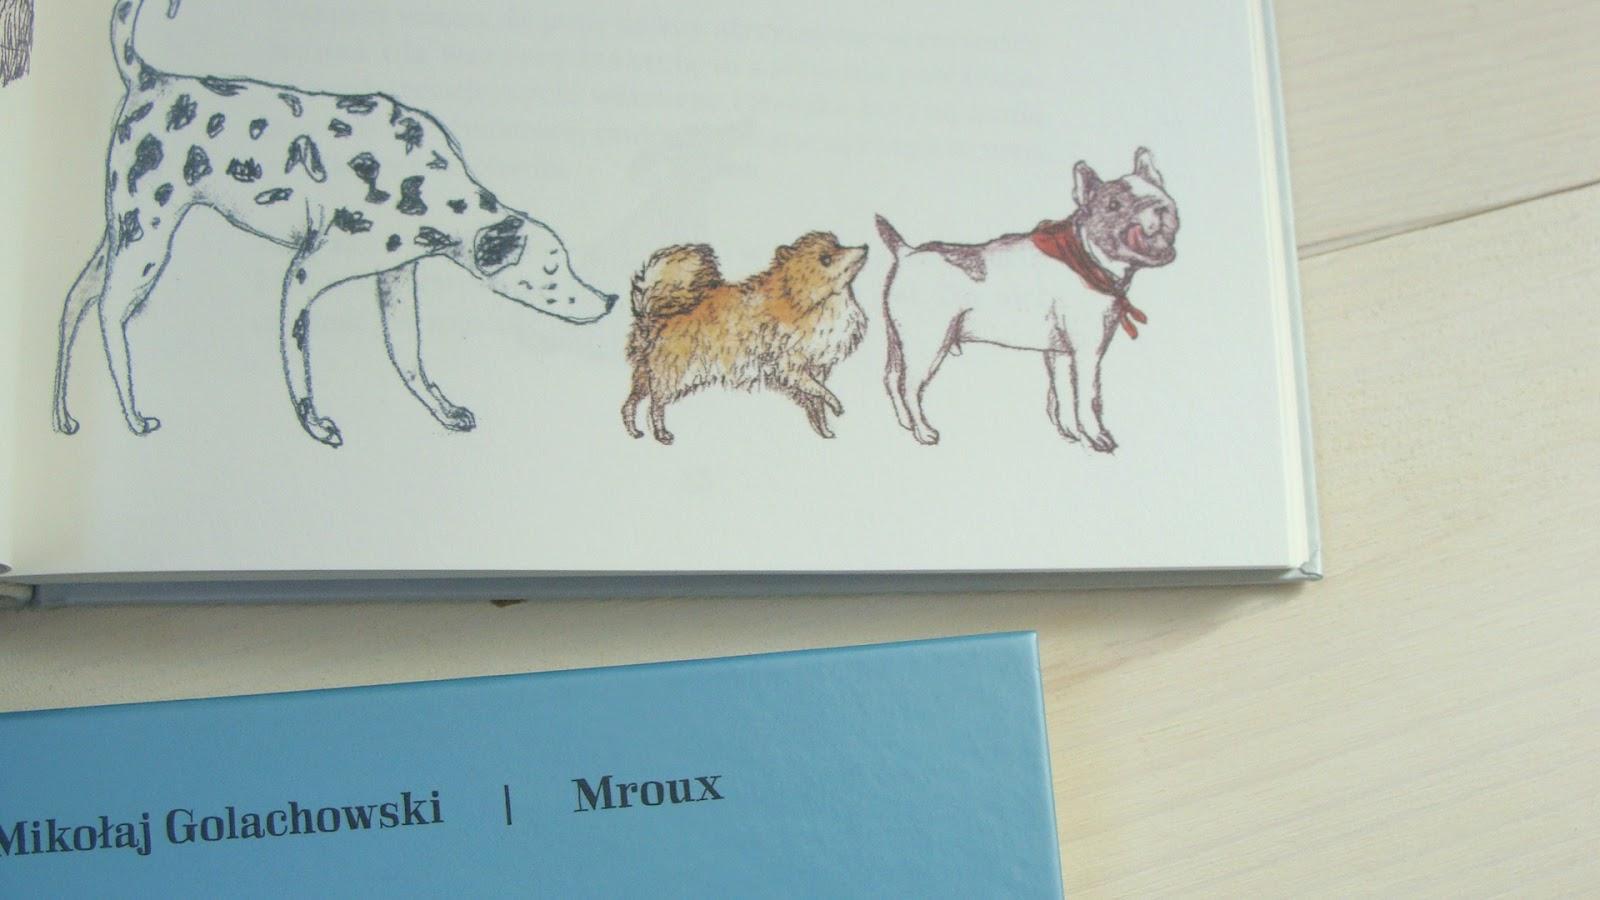 Pupy, ogonki i kuperki, Gęby, dzioby i nochale